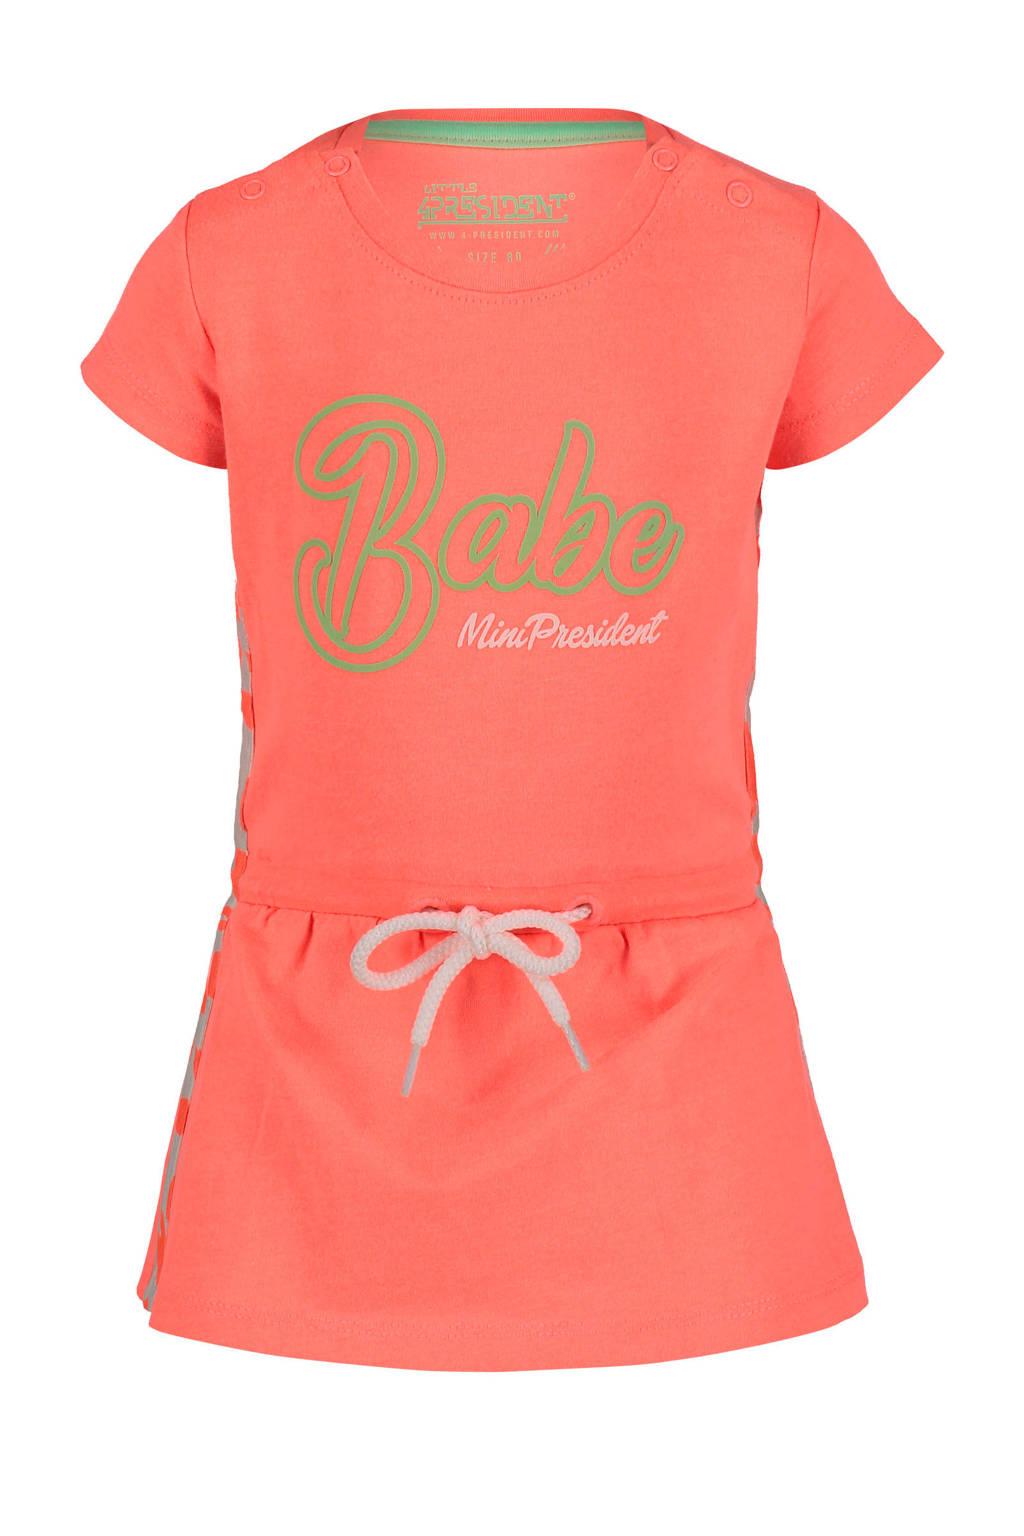 4PRESIDENT T-shirtjurk met tekst roze, Roze